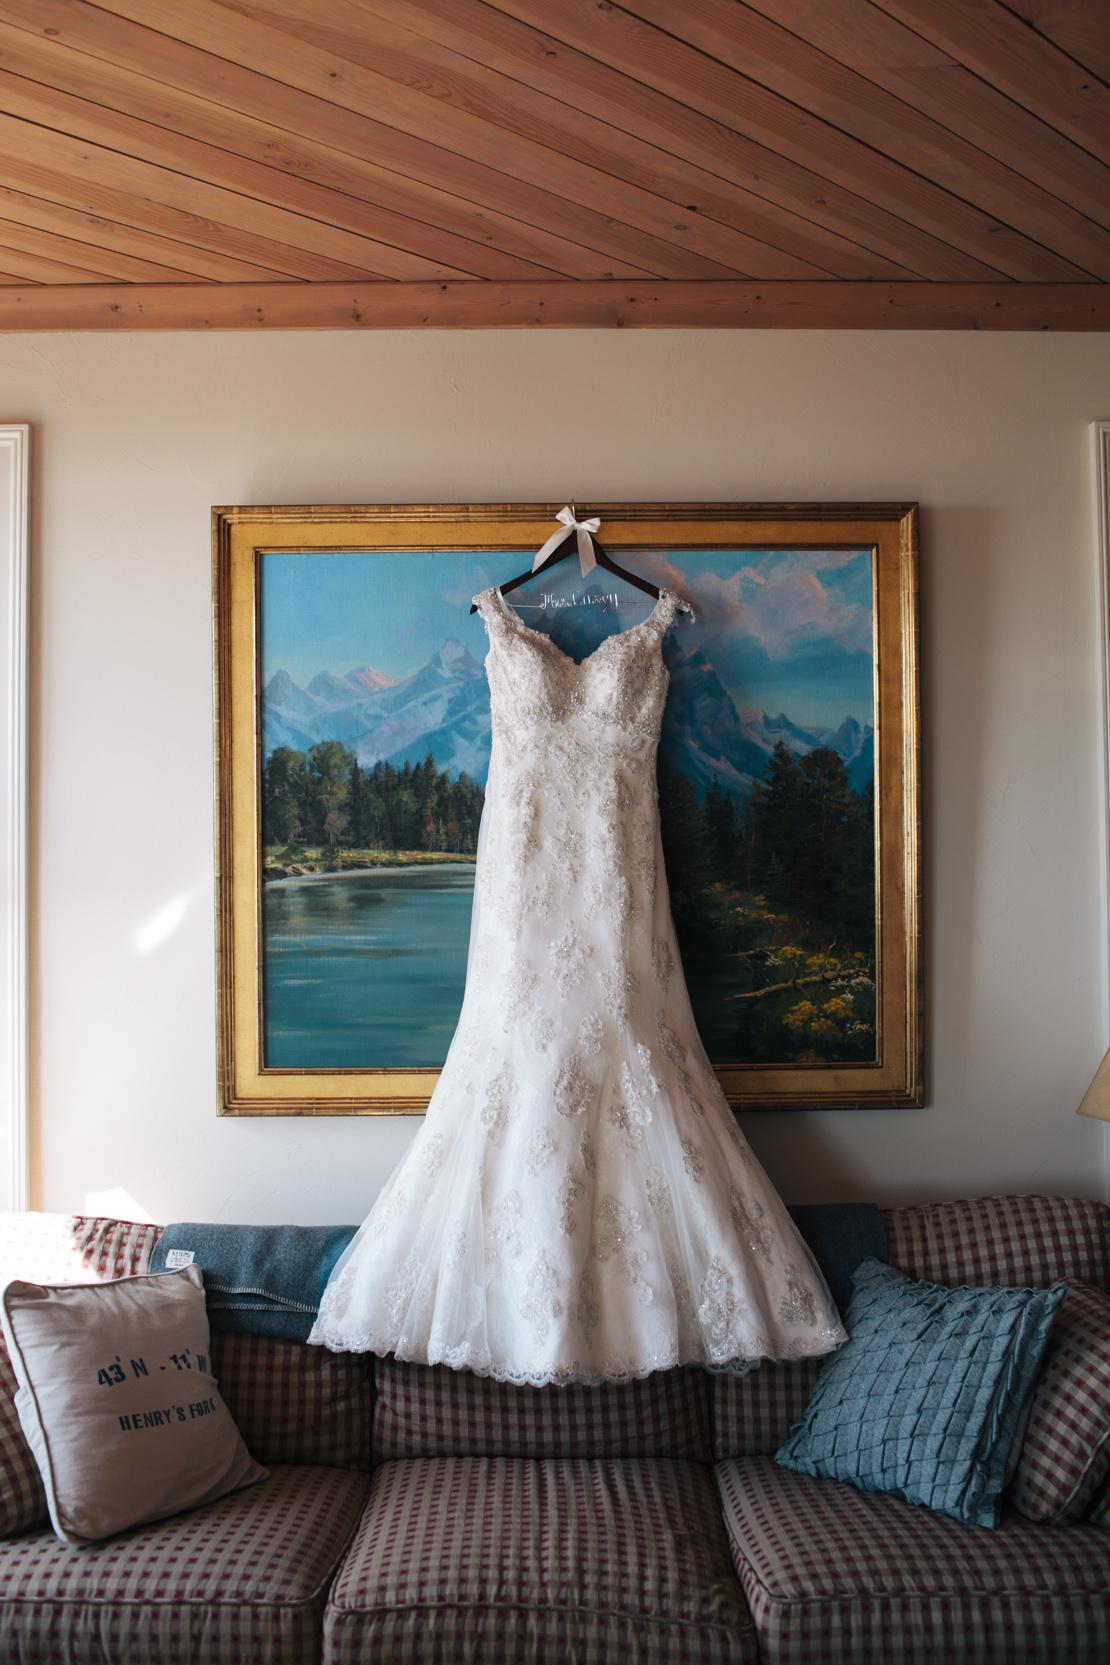 Steph-Thad-Wisconsin-Wedding_Grain-and-Compass-3.jpg